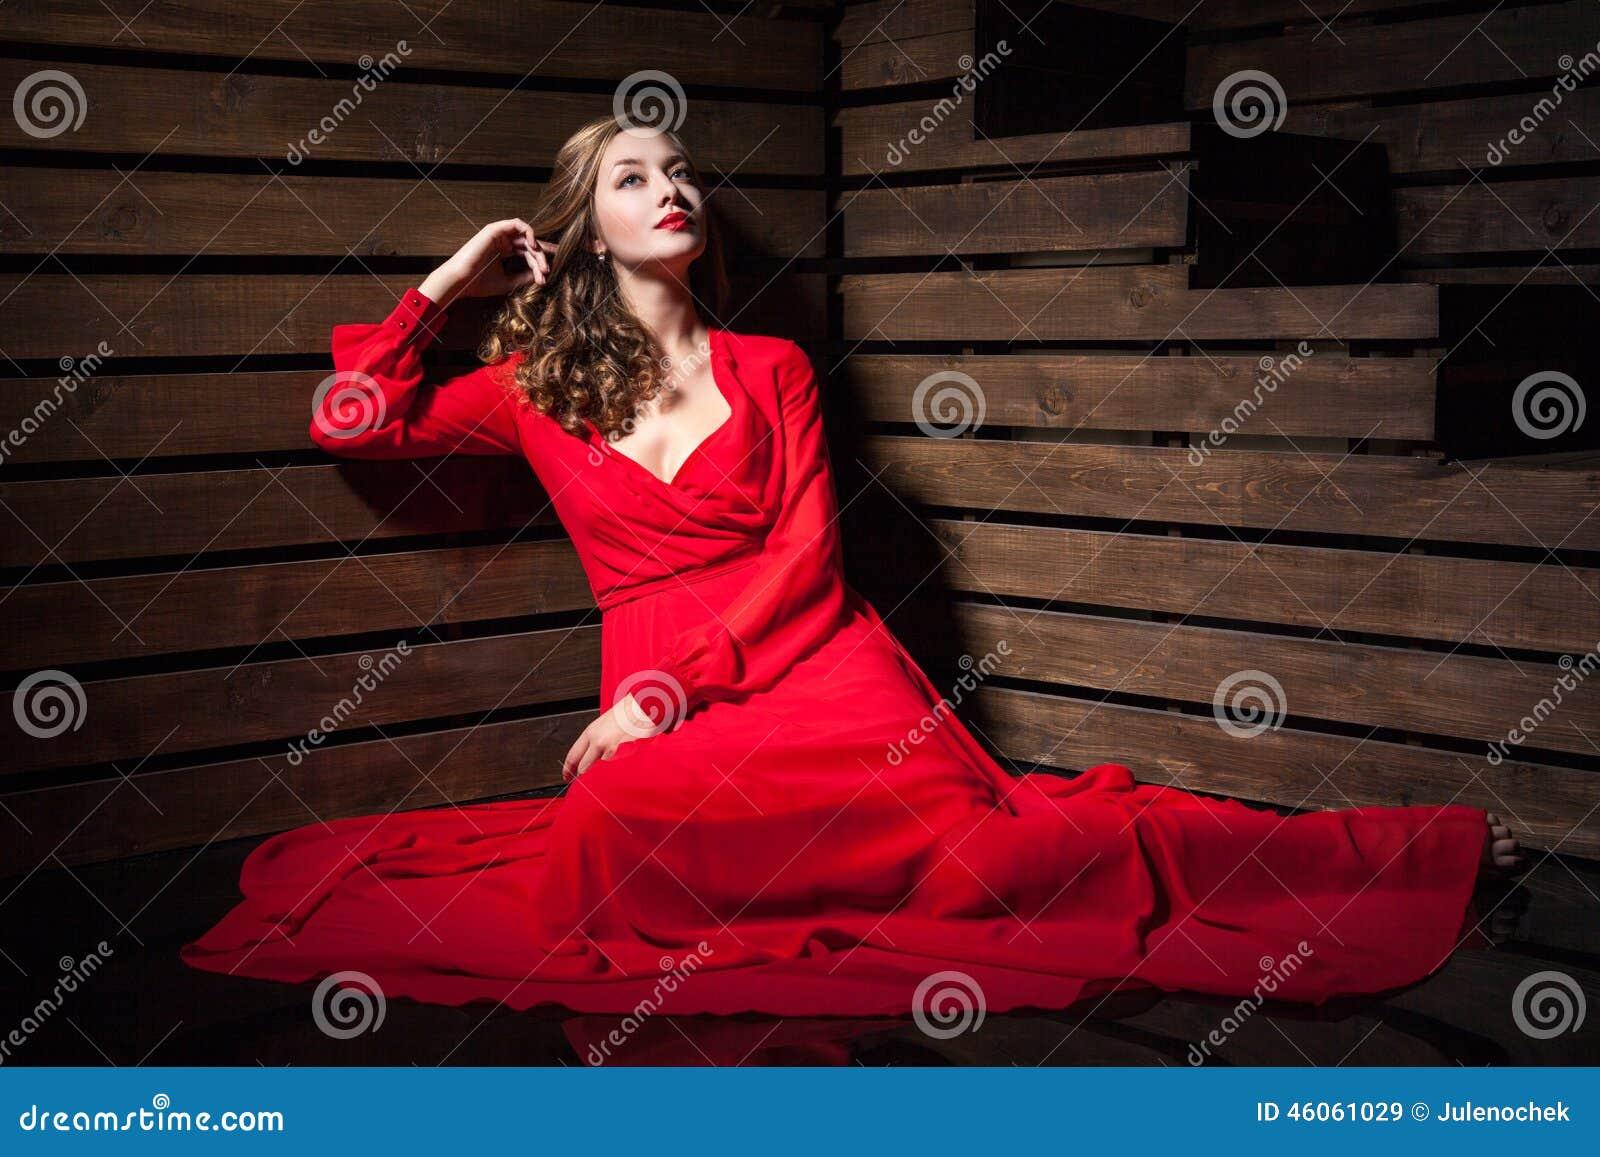 6d1155abd801 Πορτρέτο της όμορφης αισθησιακής γυναίκας στη μακροχρόνια συνεδρίαση  φορεμάτων μόδας κόκκινη στο πάτωμα πέρα από το ξύλινο υπόβαθρο